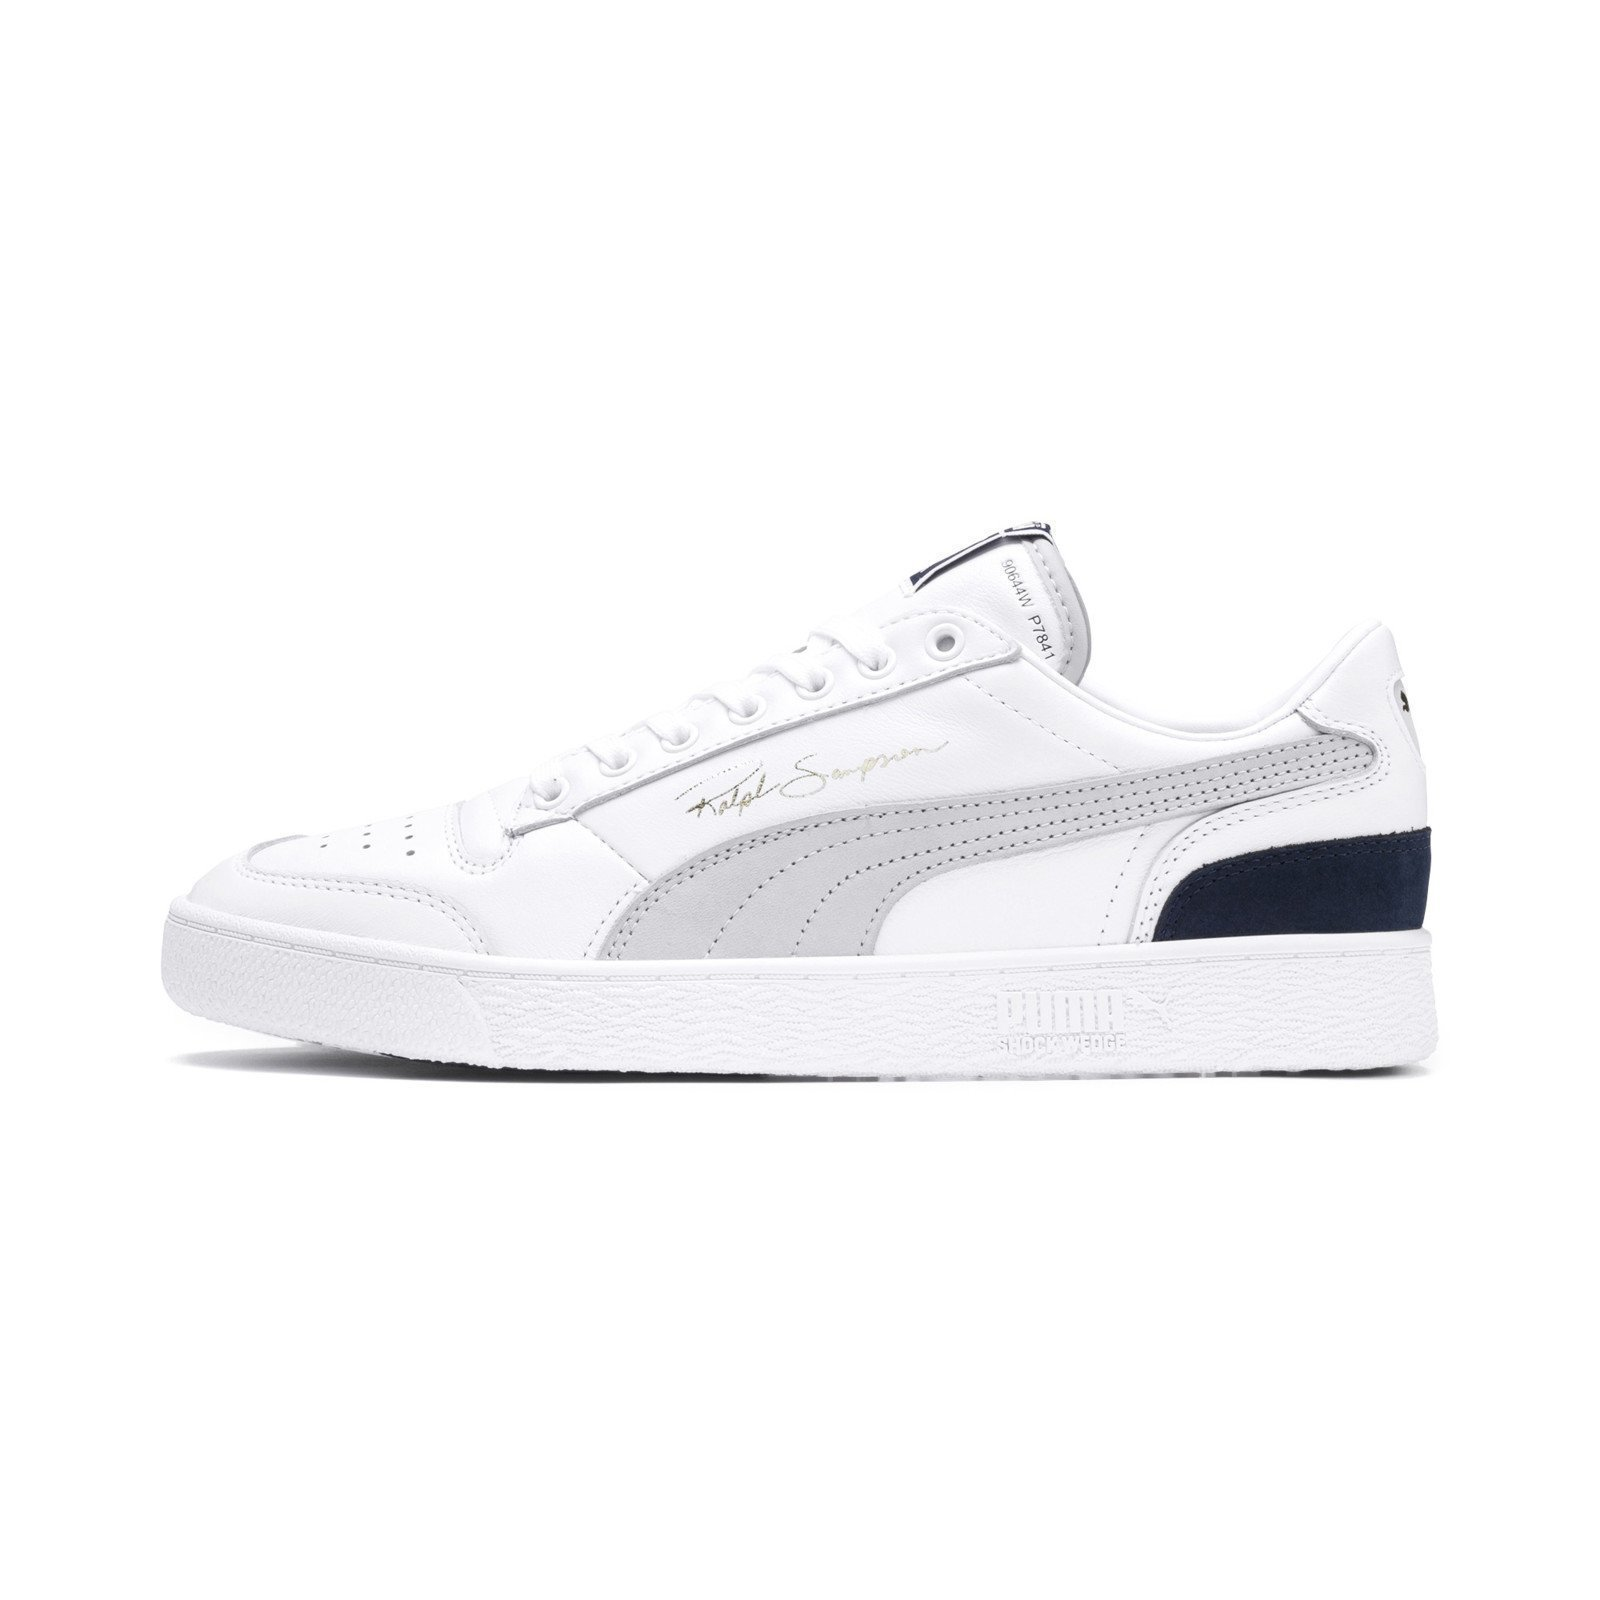 Puma Ralph Sampson Low OG 'White' (370719-01)